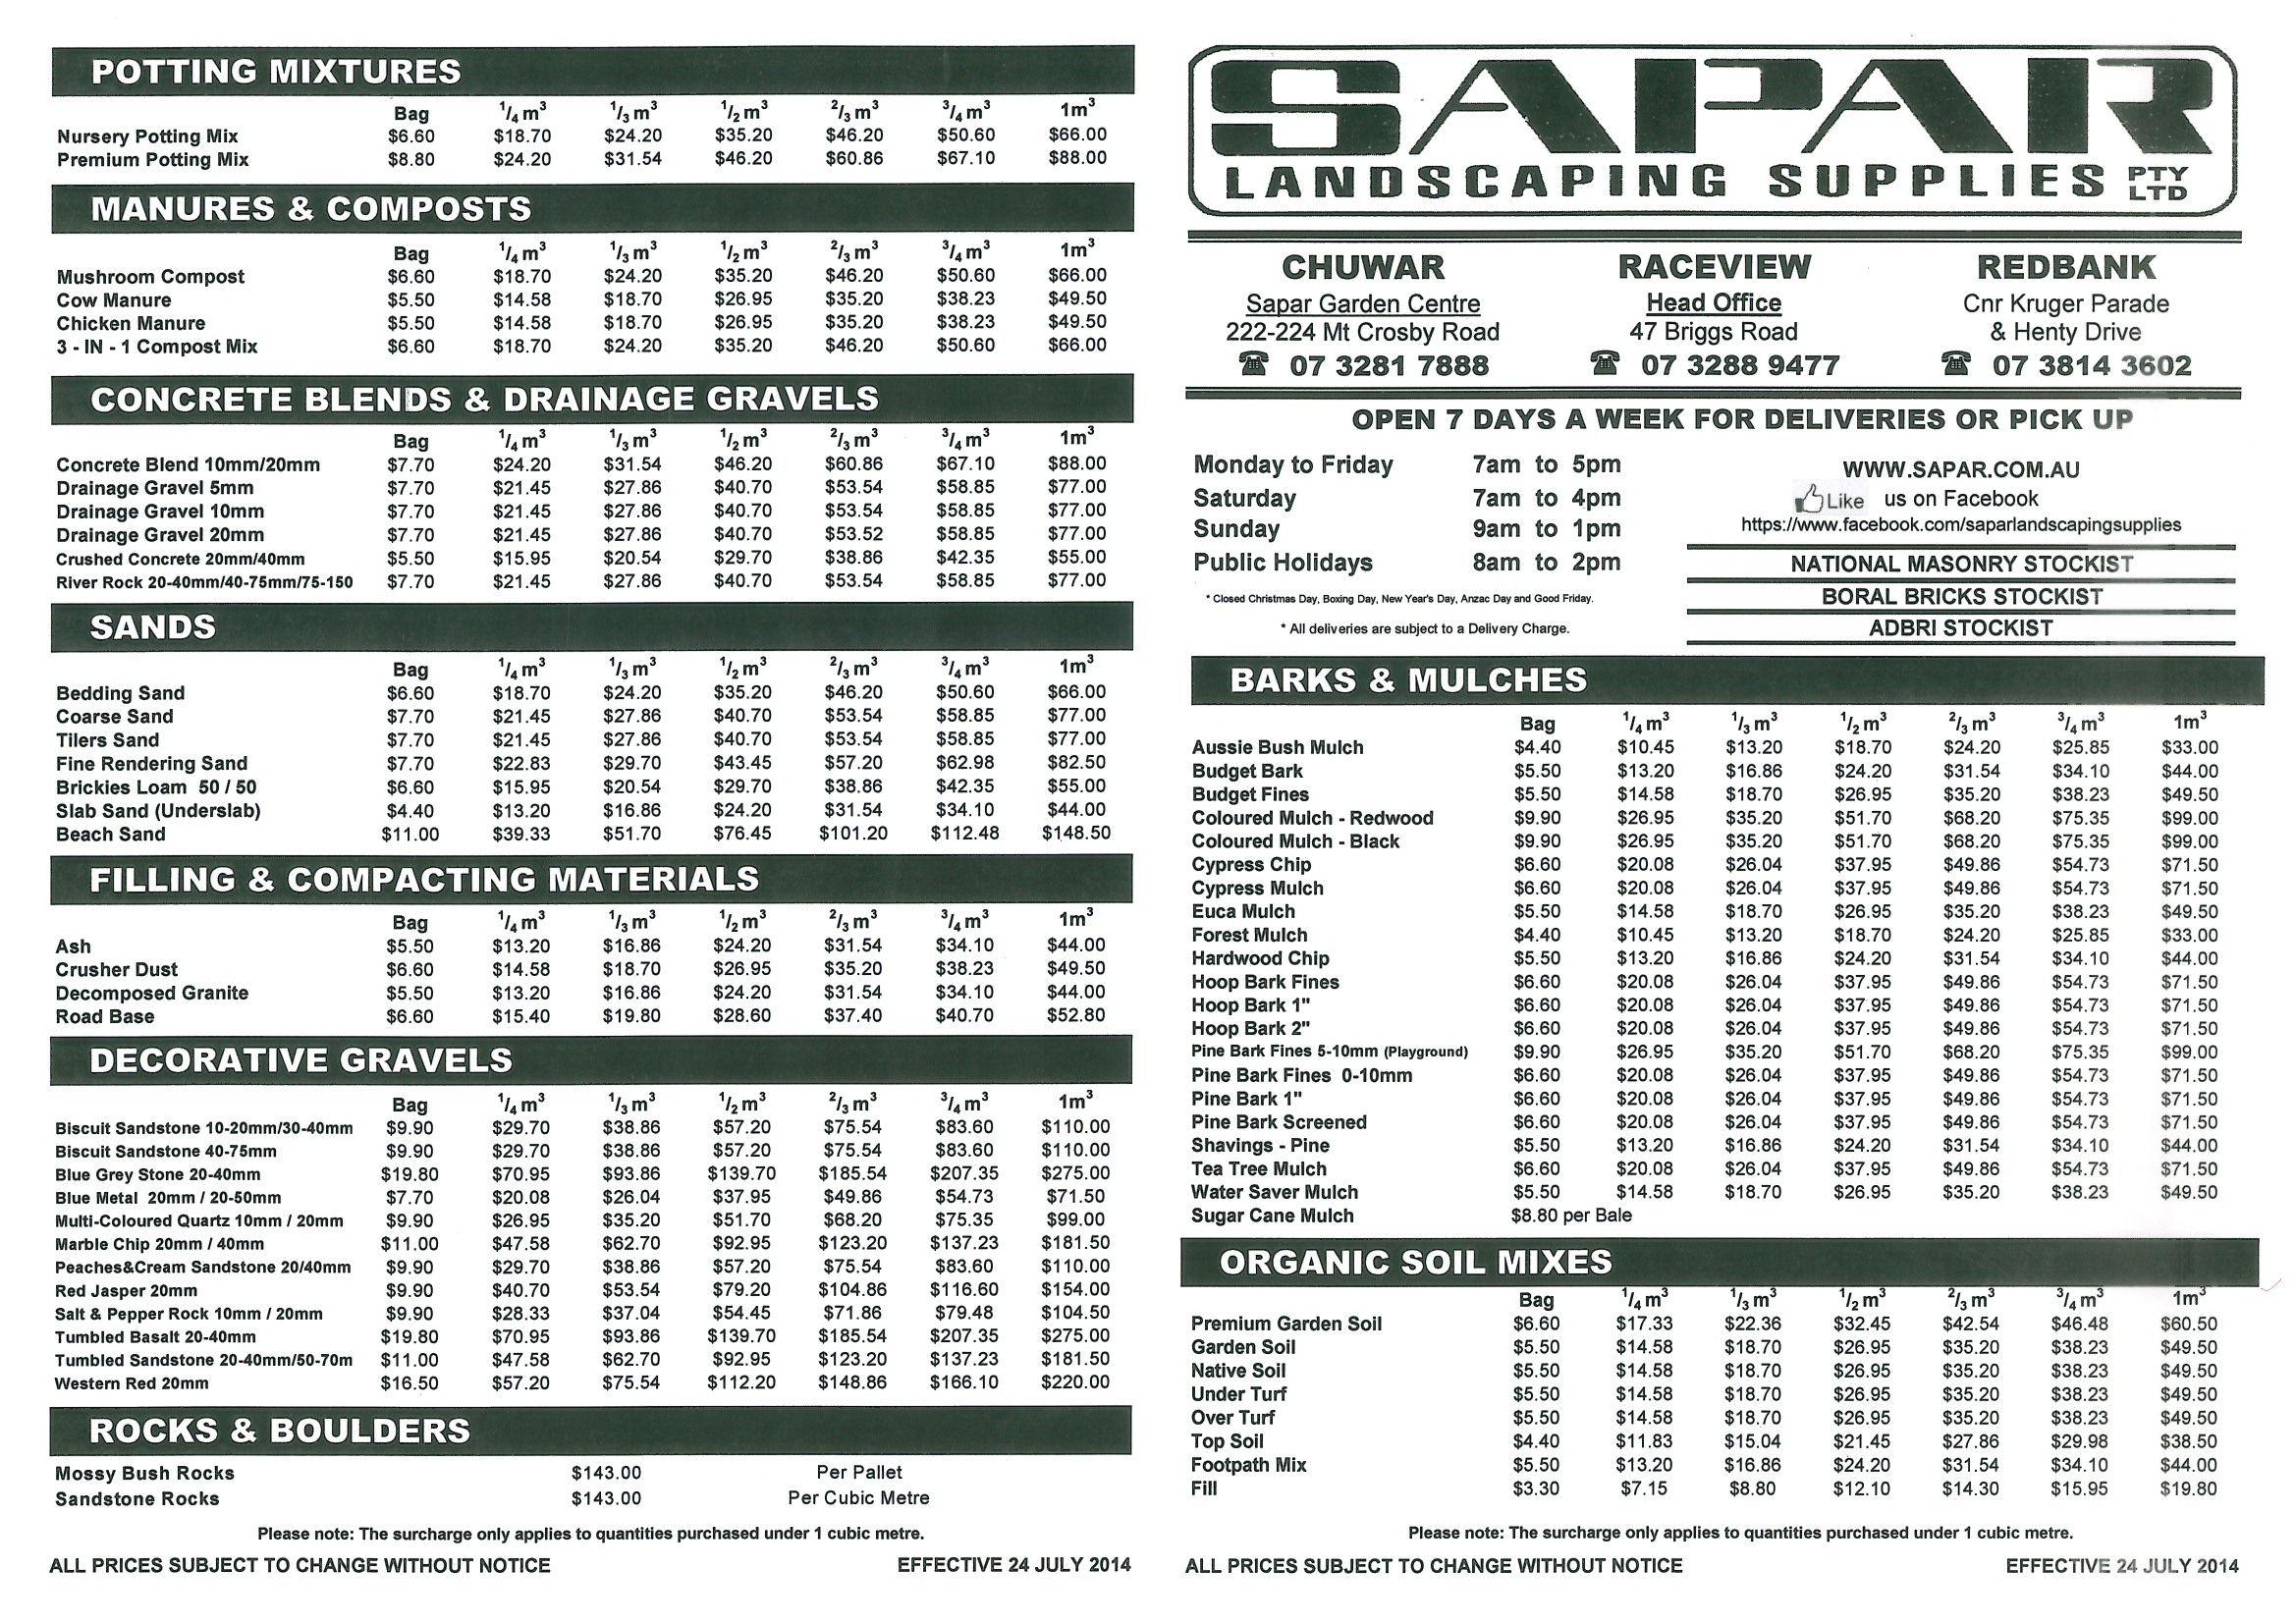 Sapar Landscaping Supplies Current Price List Landscaping Supplies Landscape Potting Mixture